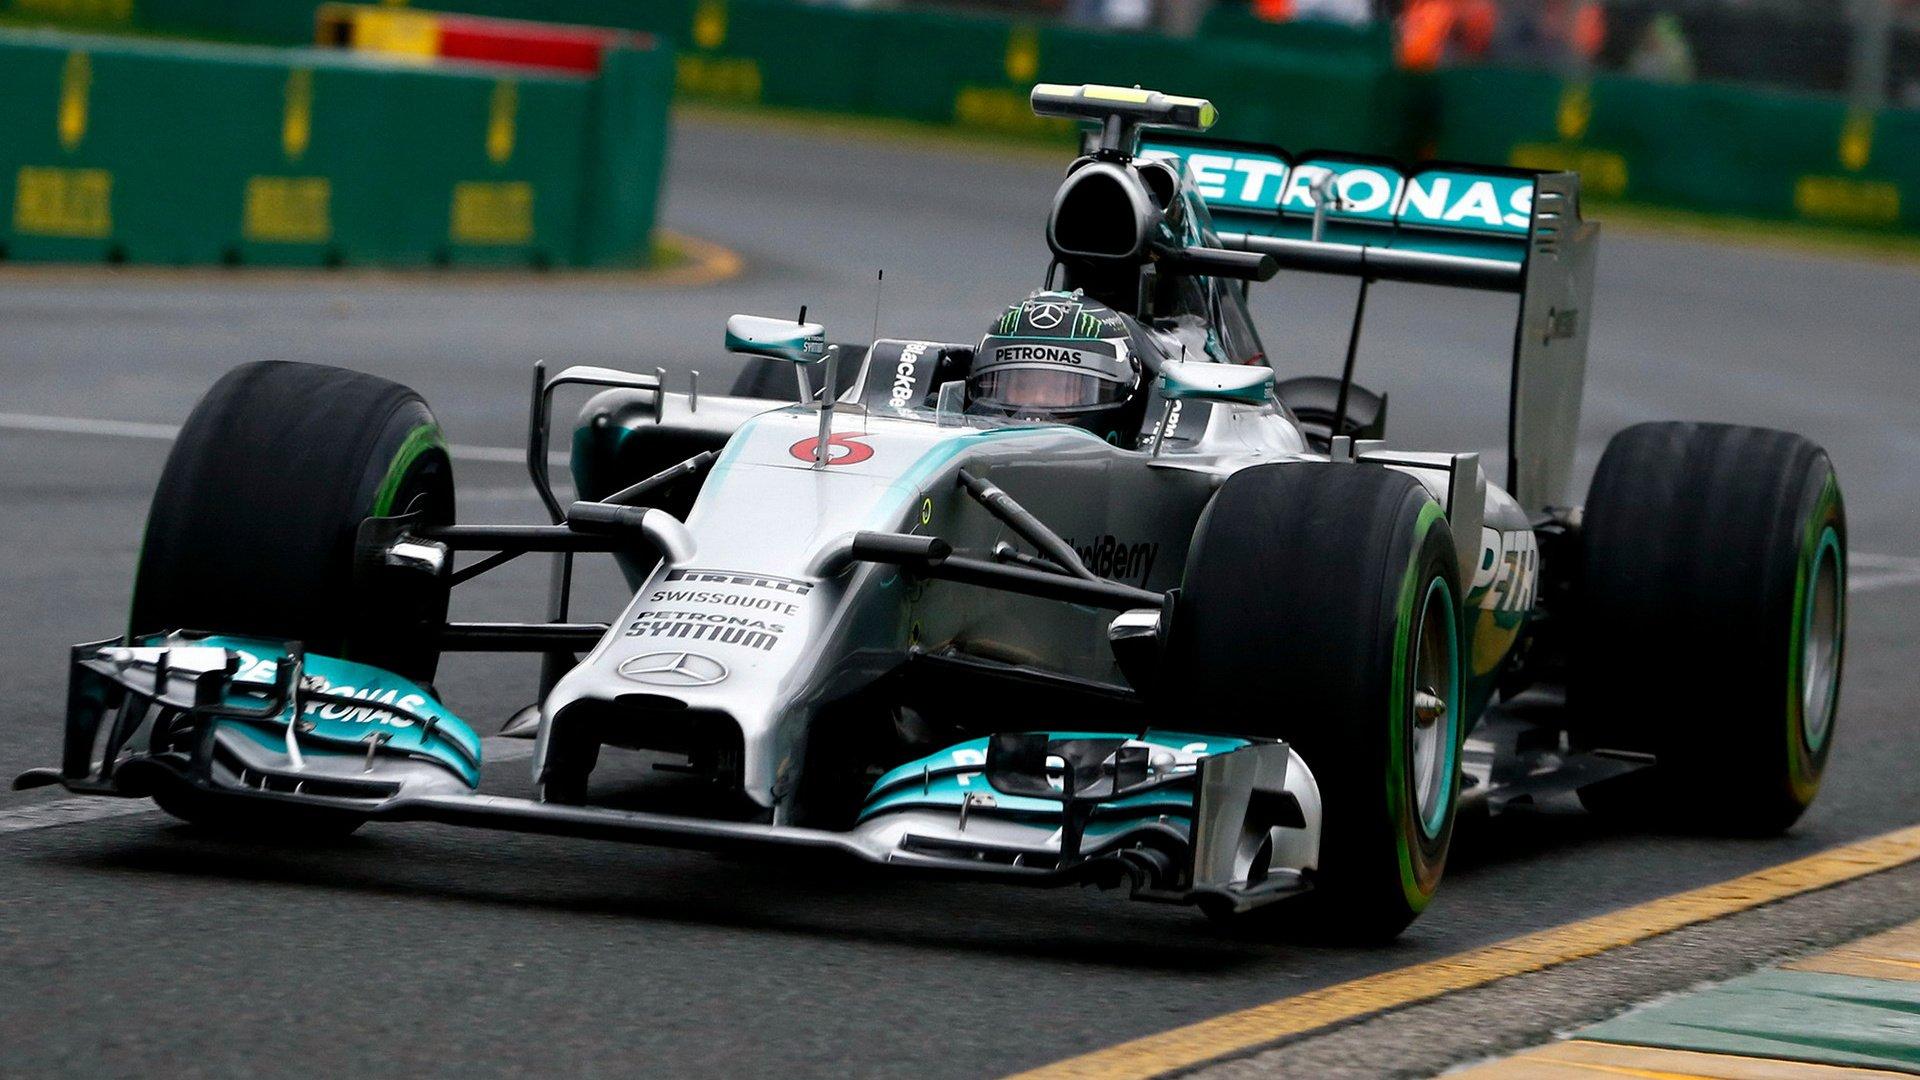 2014 Mercedes Amg F1 W05 Hybrid Hd Wallpaper Background Image